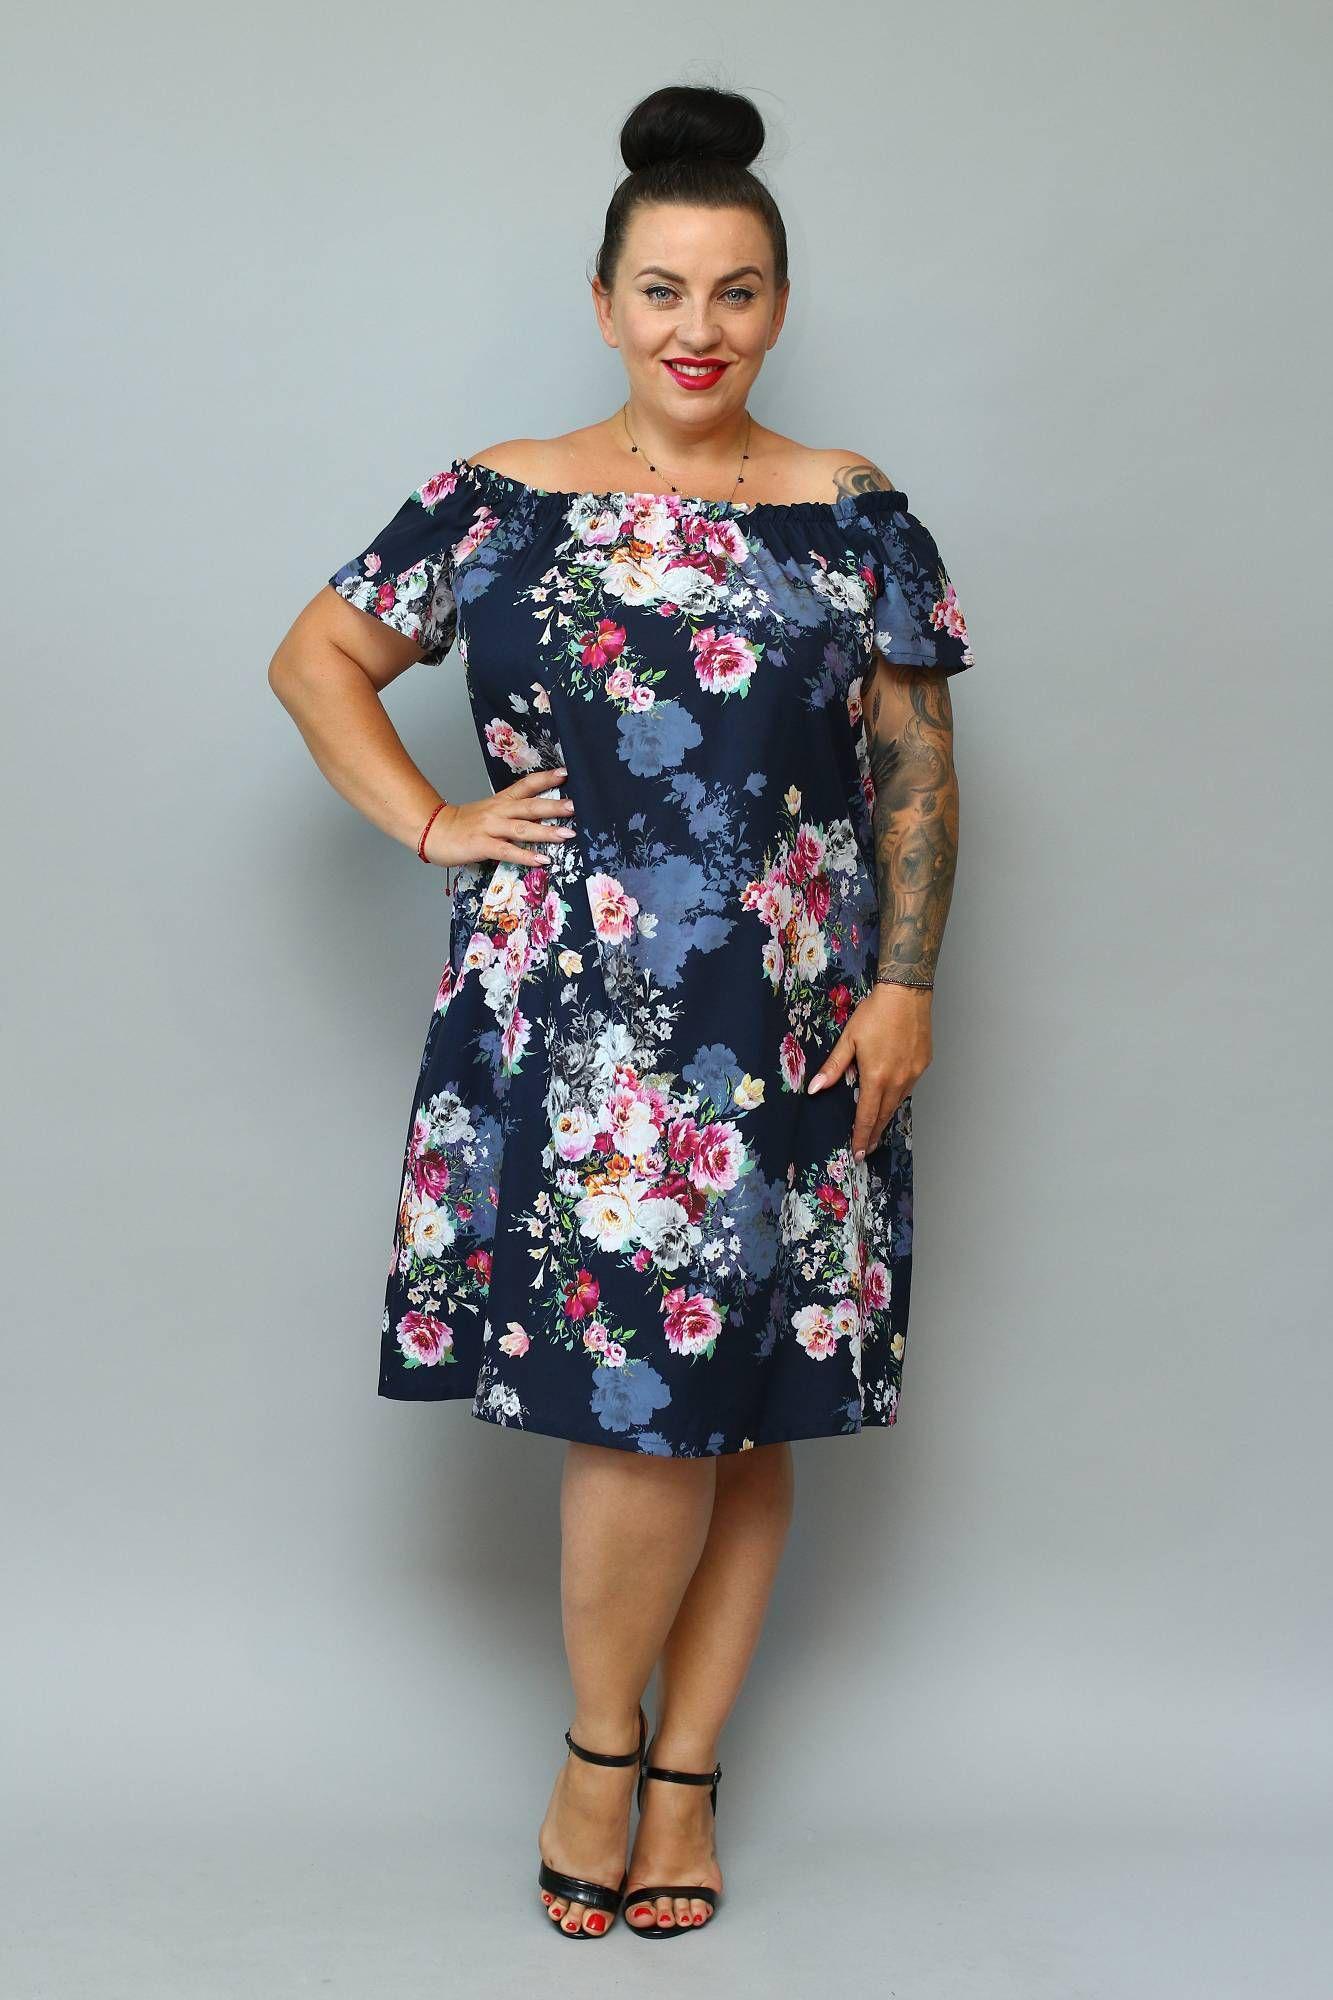 Sukienka Marita Letnia Hiszpanka Granatowa W Bukiety Kwiatow Promocja Casual Dress Cold Shoulder Dress Fashion